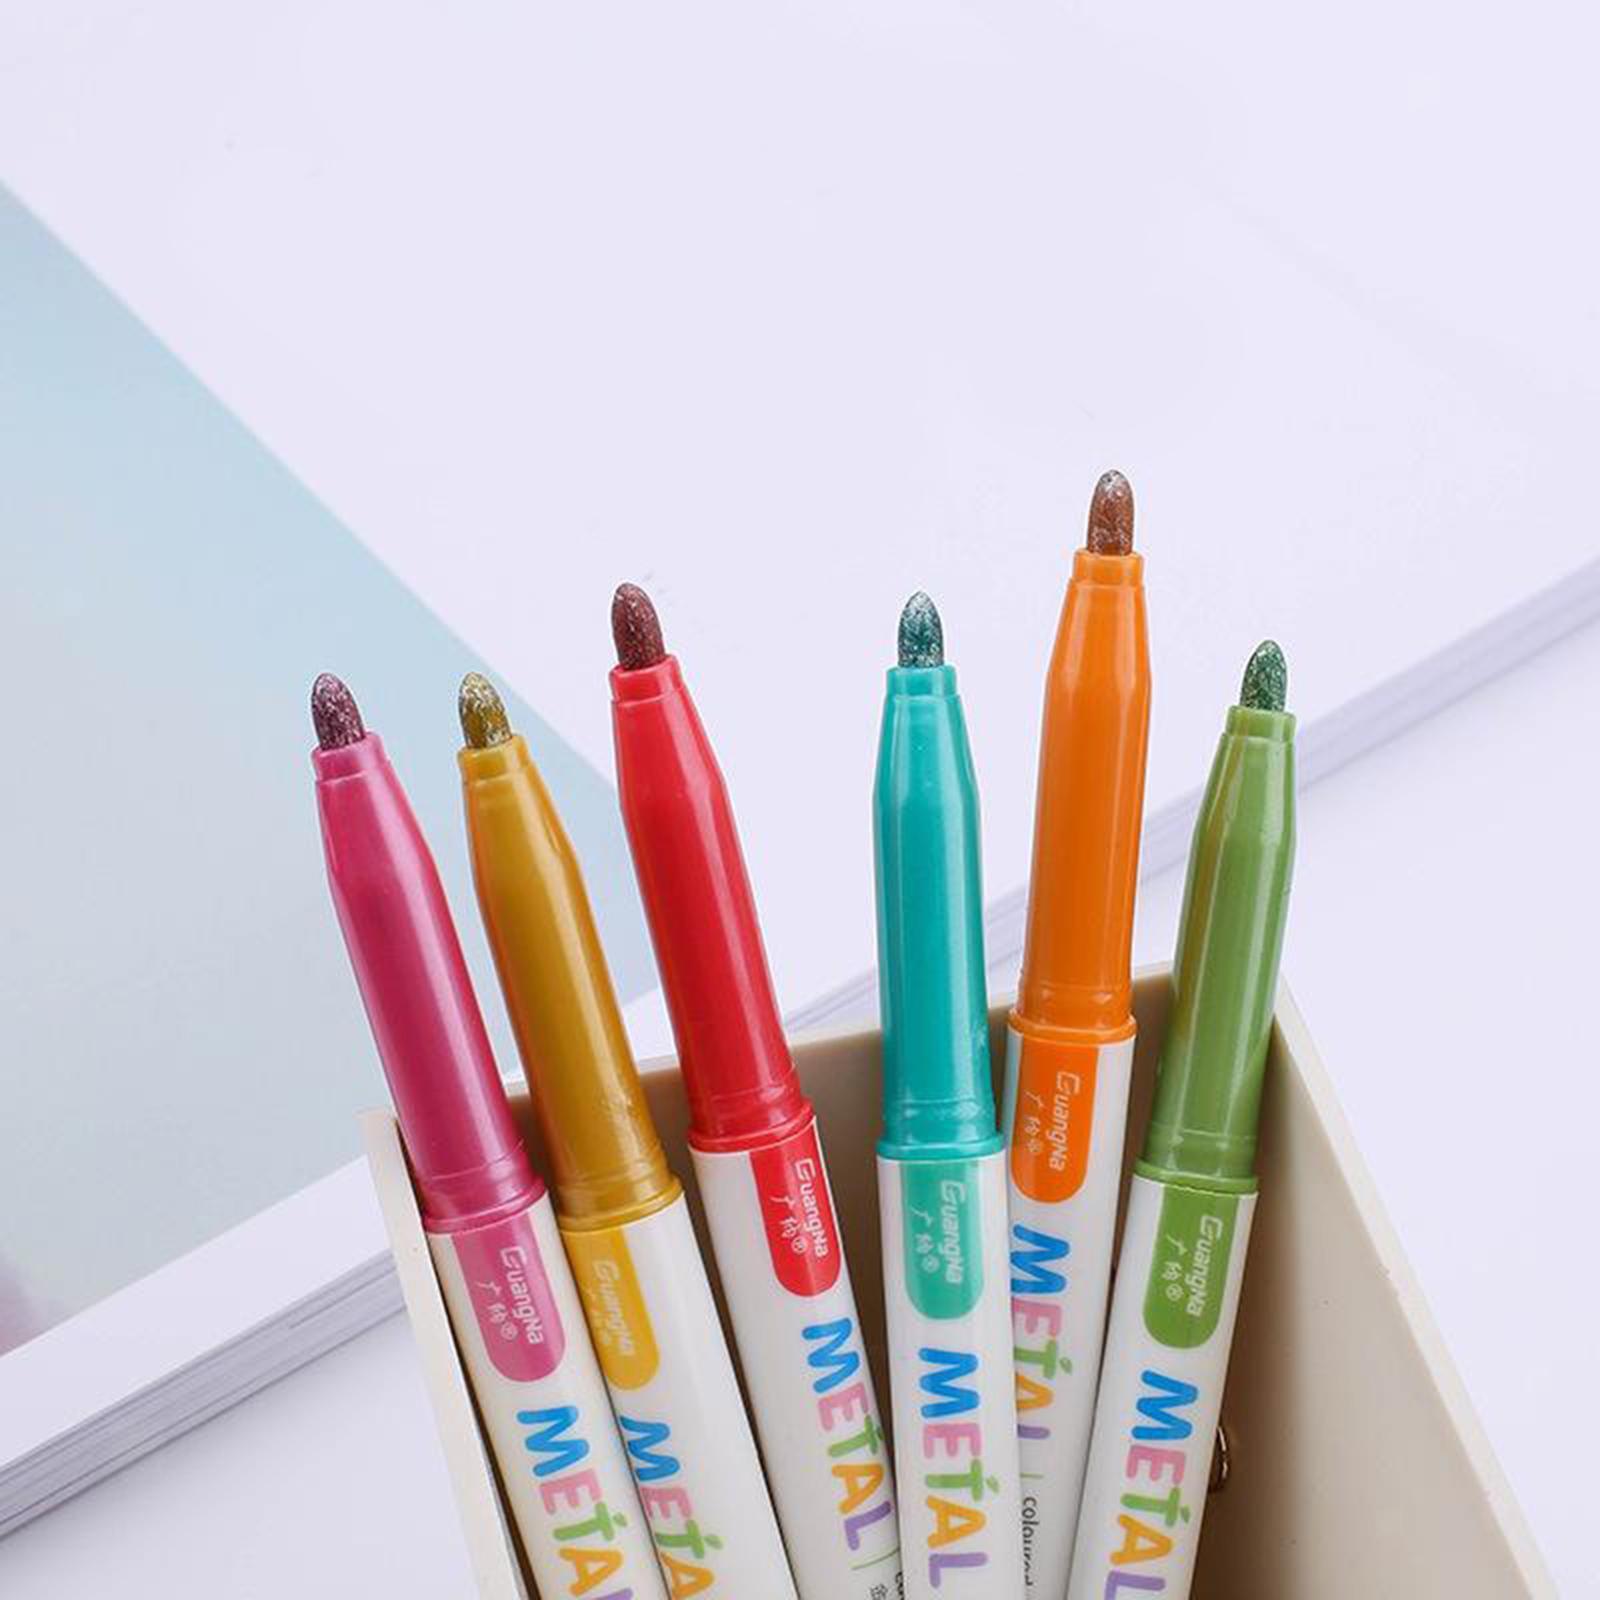 miniatura 10 - 8-12-20x-Permanente-Metallic-Marcatori-Vernici-Penne-per-Adulti-Colouring